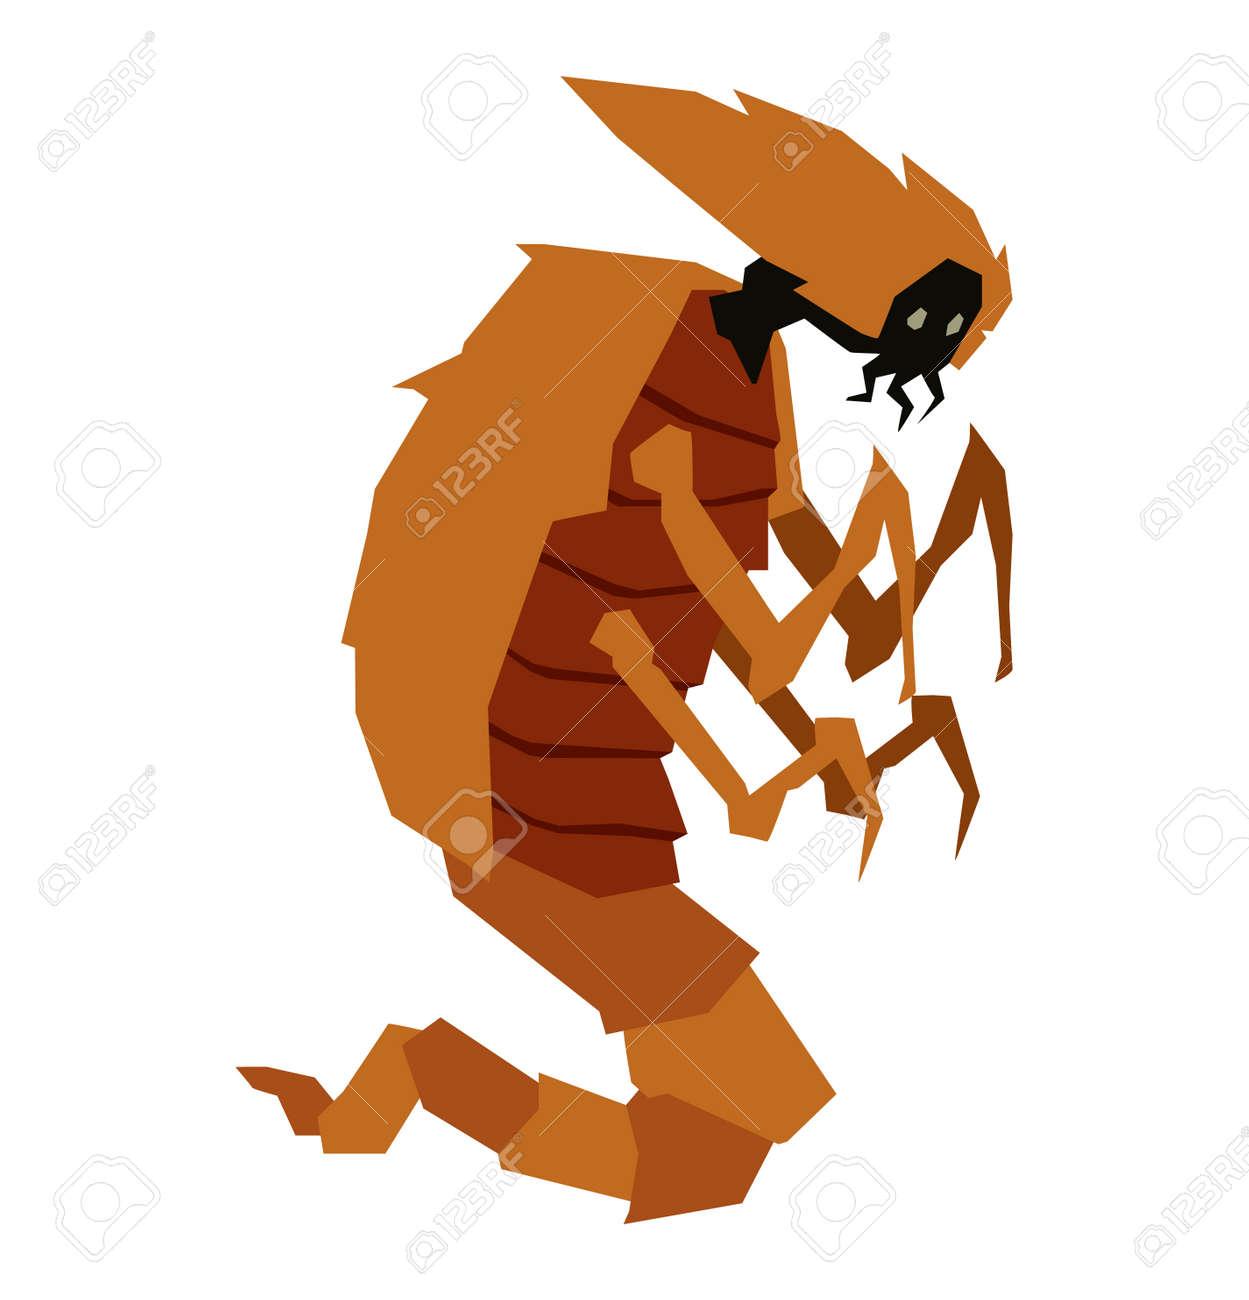 cartoon alien monster graphic mutant character toy cute alien